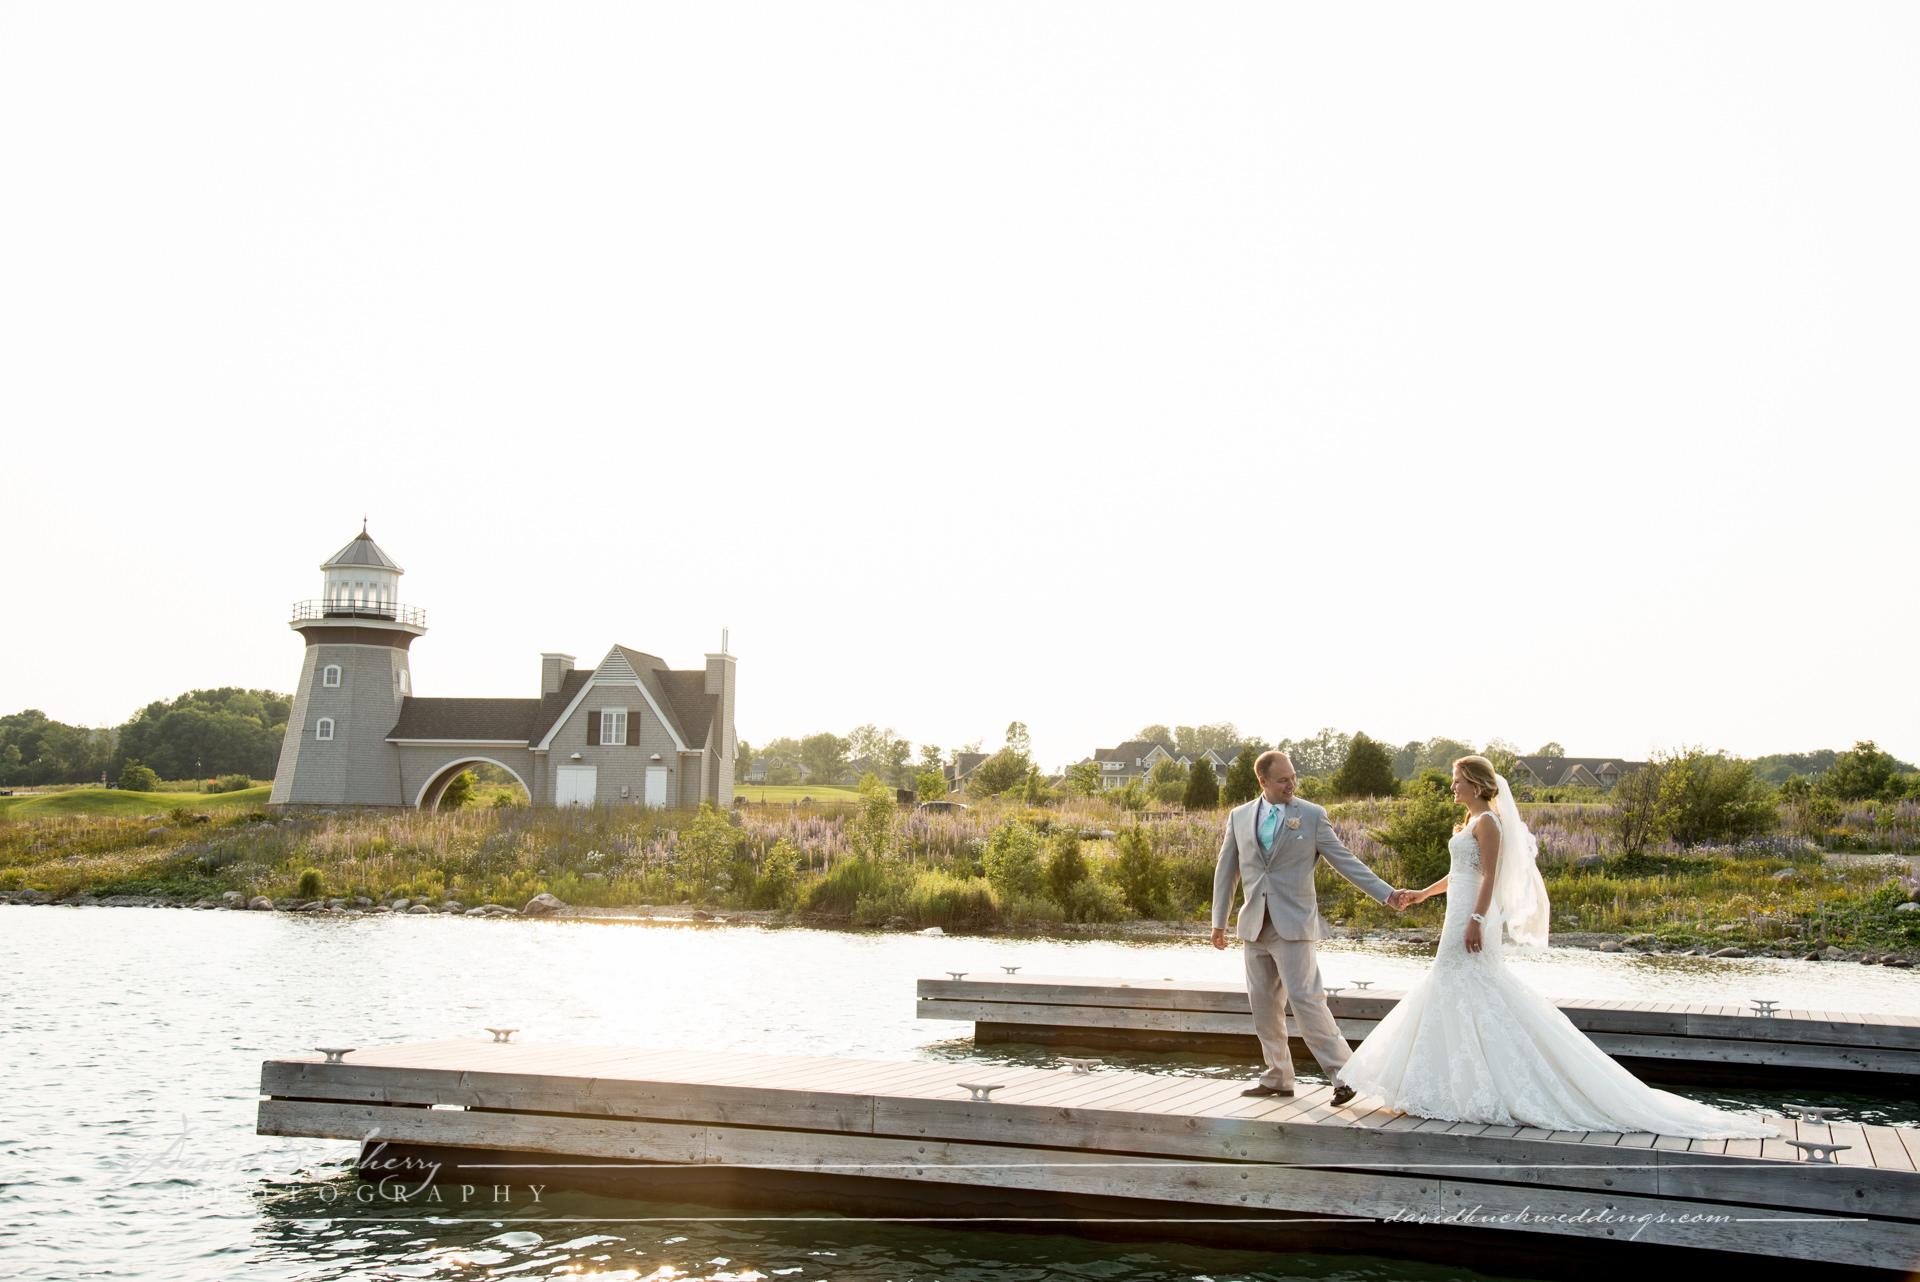 Cobble_Beach_Wedding_Photography_Owen_Sound_37